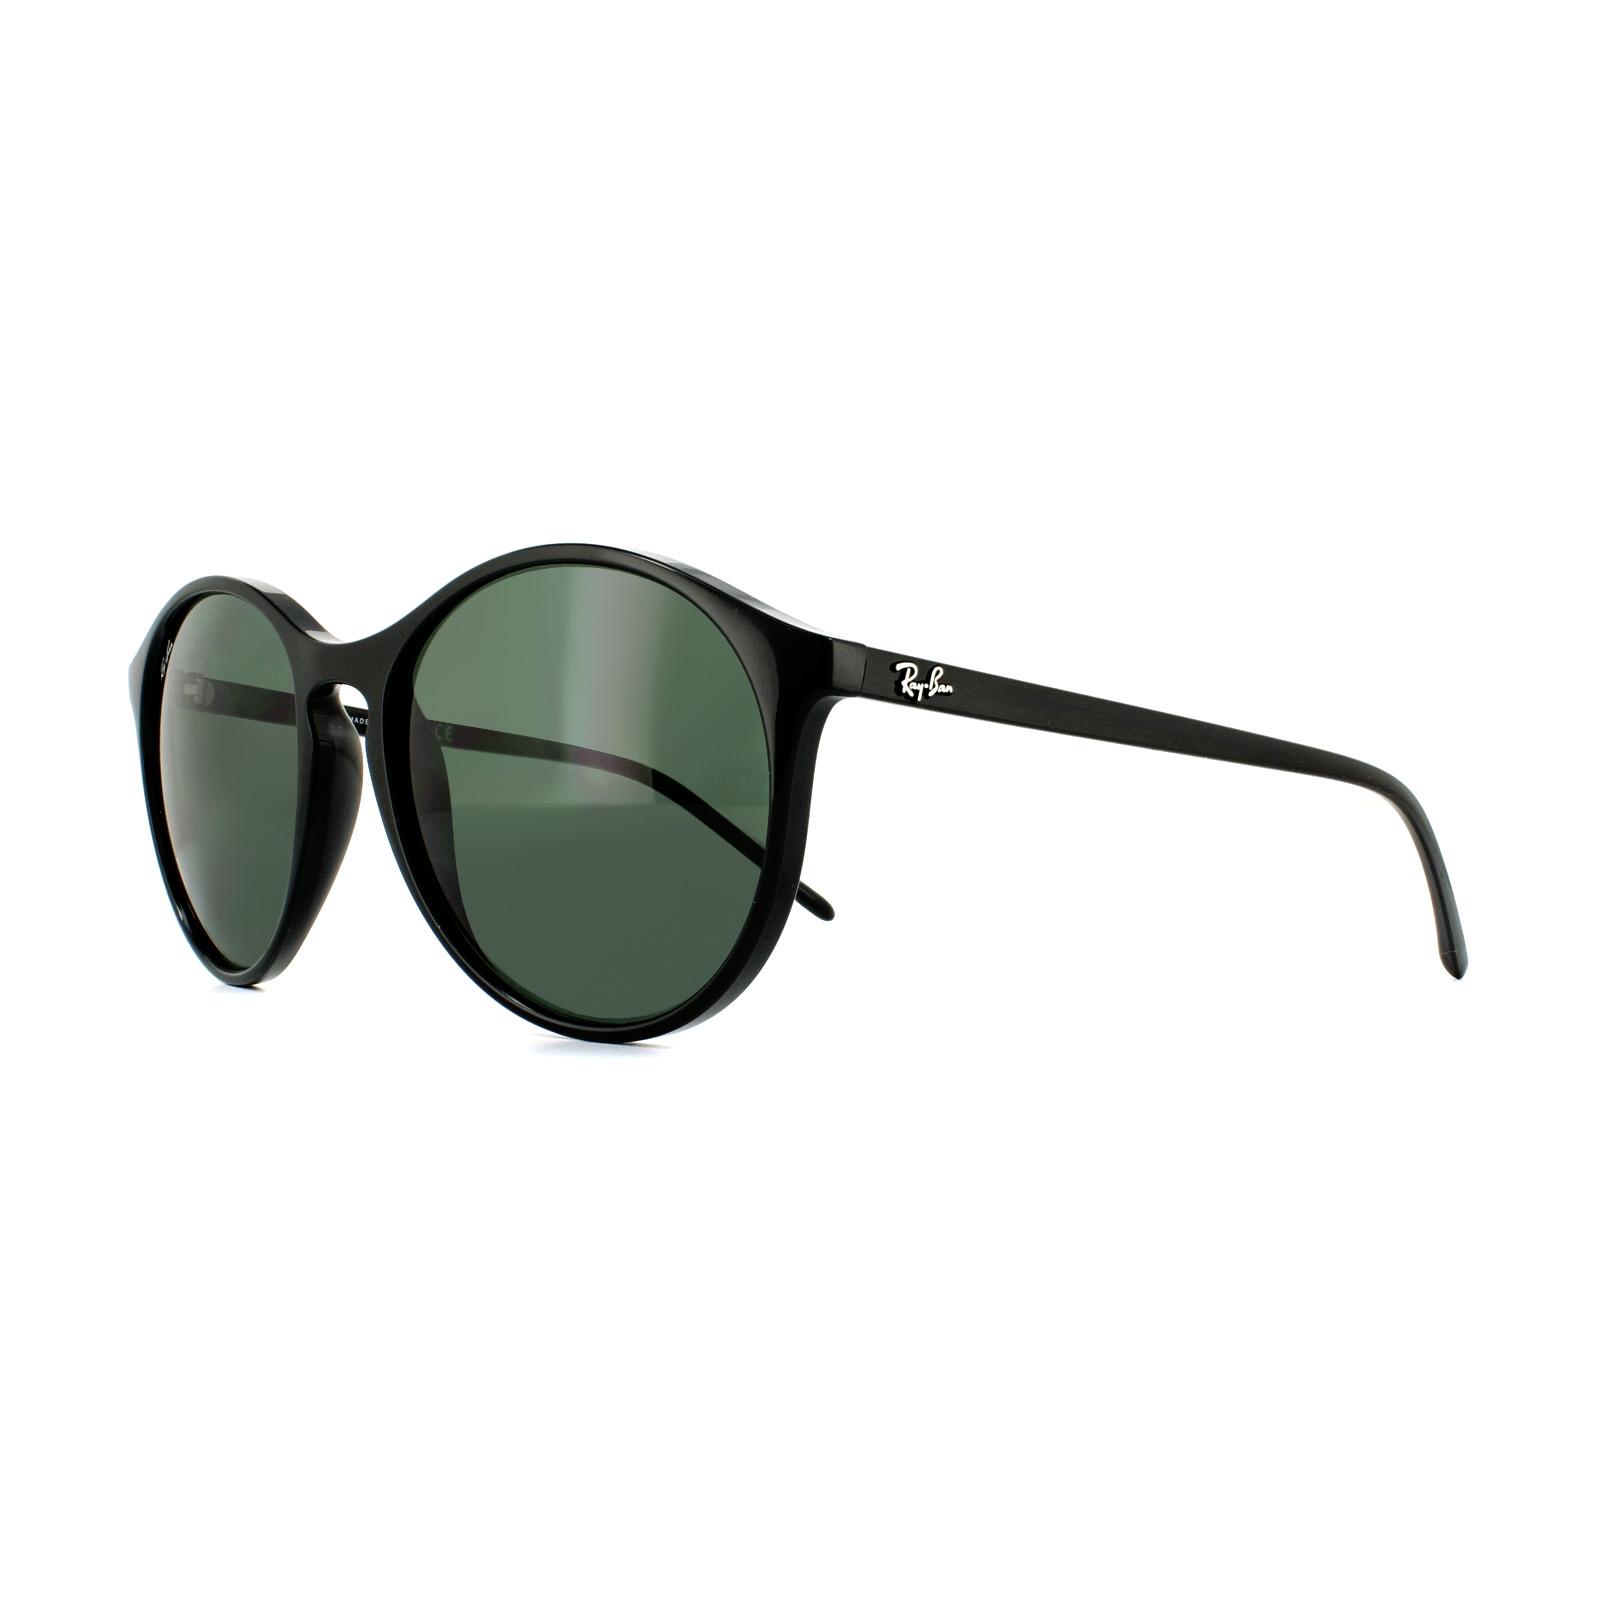 3db81841da Sentinel Thumbnail 1. Sentinel Ray-Ban Sunglasses ...